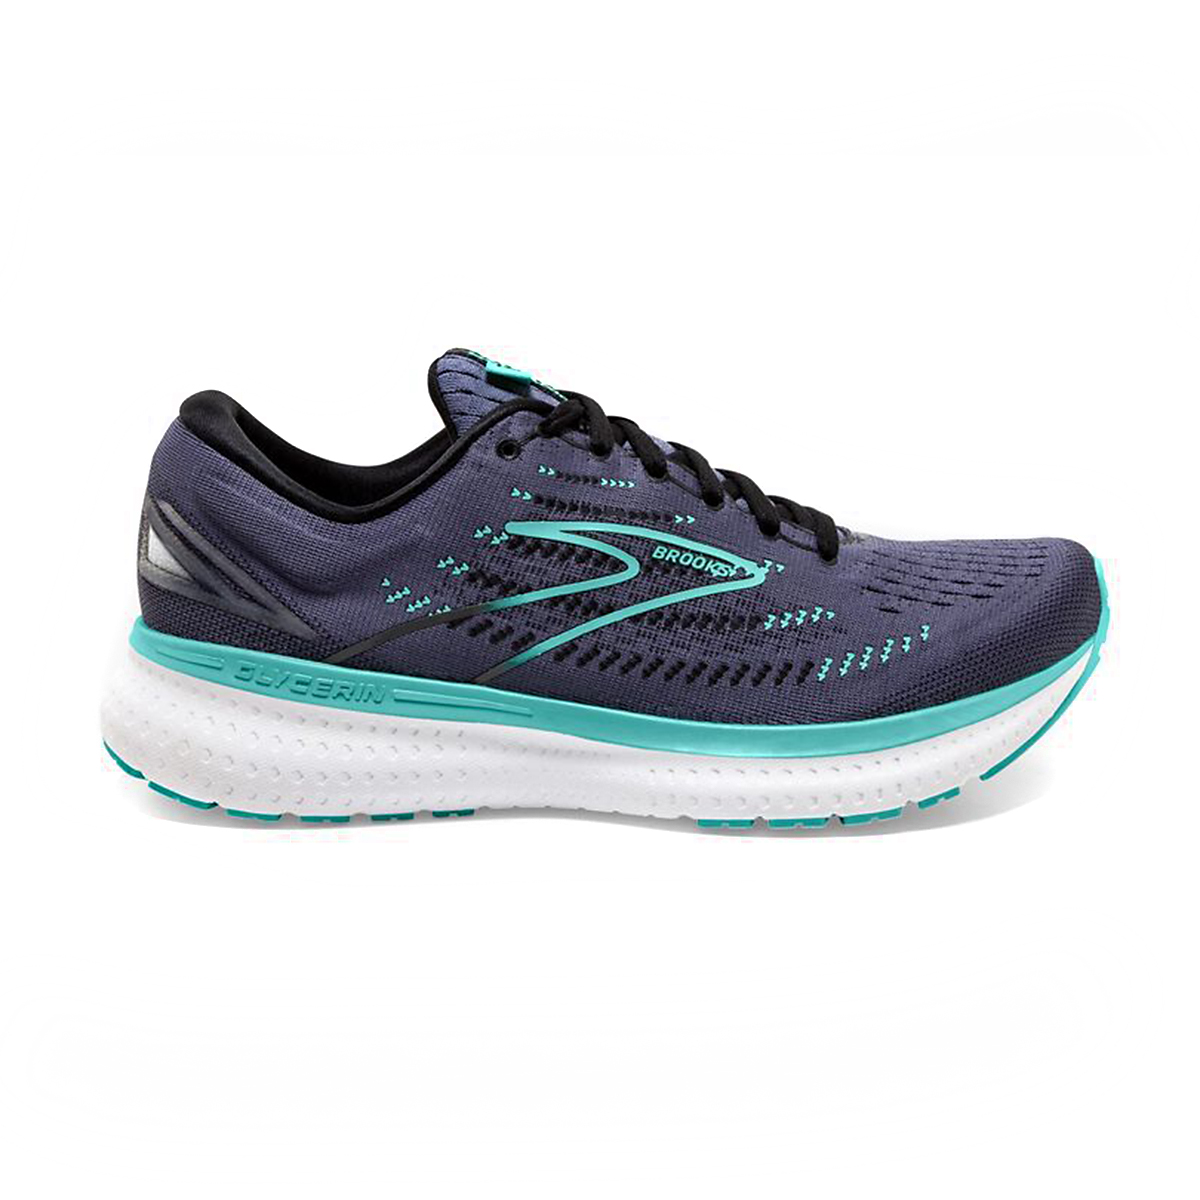 Women's Brooks Glycerin 19 Running Shoe - Color: Nightshadow/Bla - Size: 5 - Width: Regular, Nightshadow/Bla, large, image 1